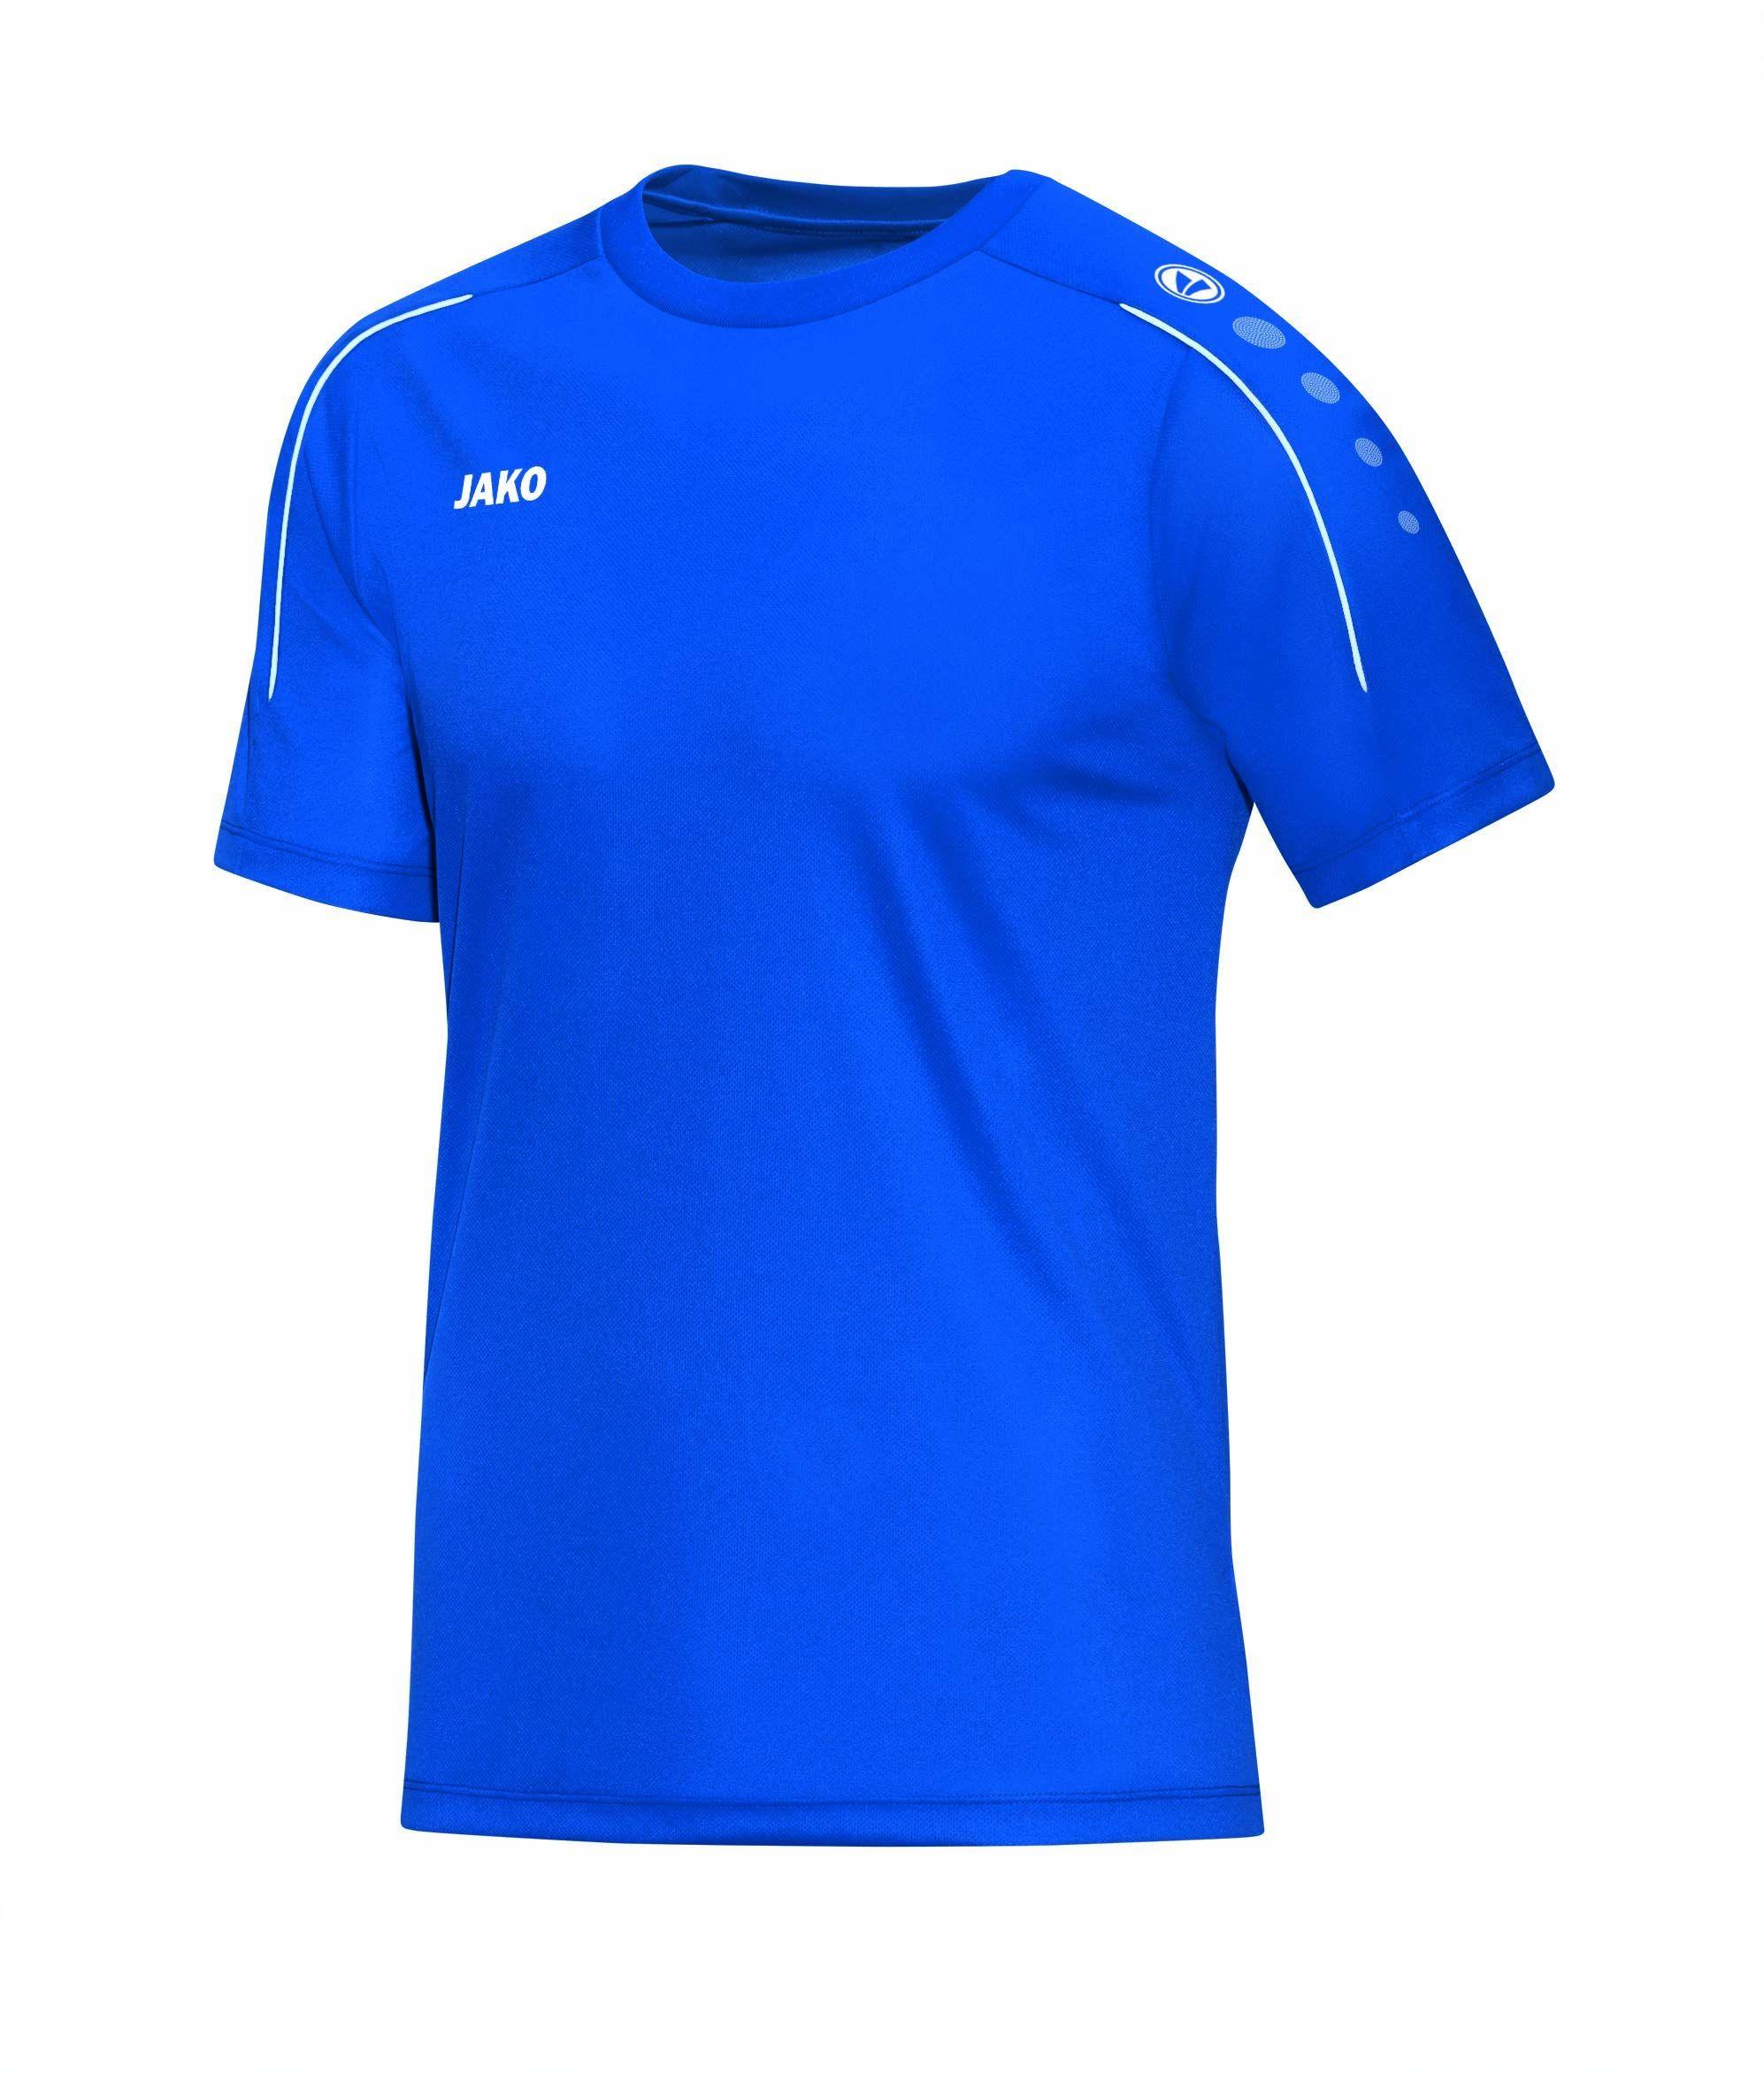 JAKO Classic T-shirt, royal, 152